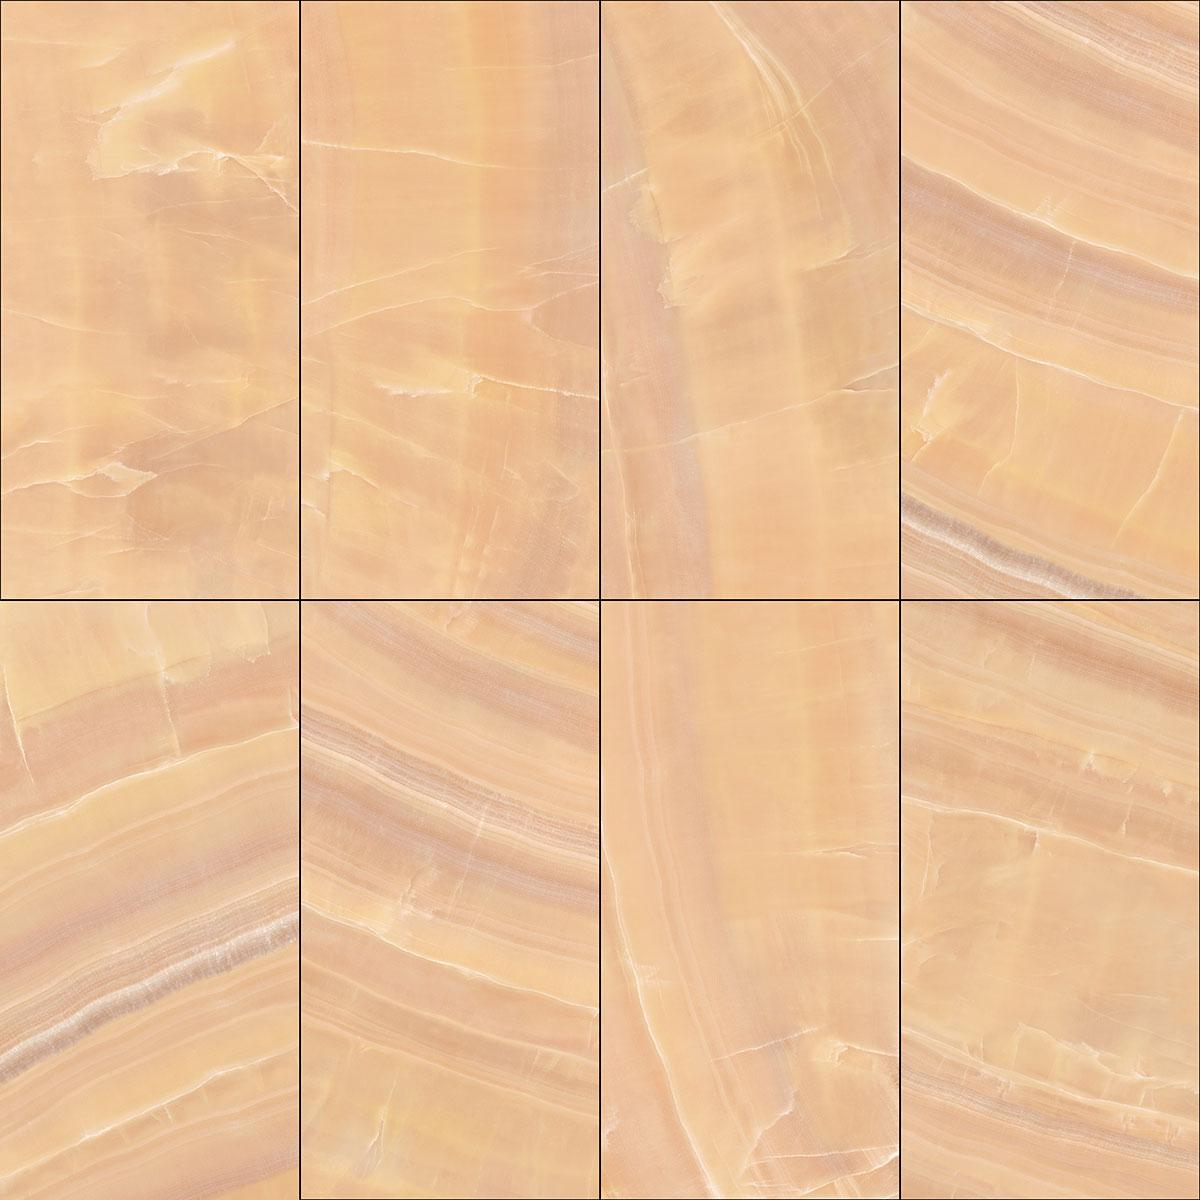 carreau de marbre poli